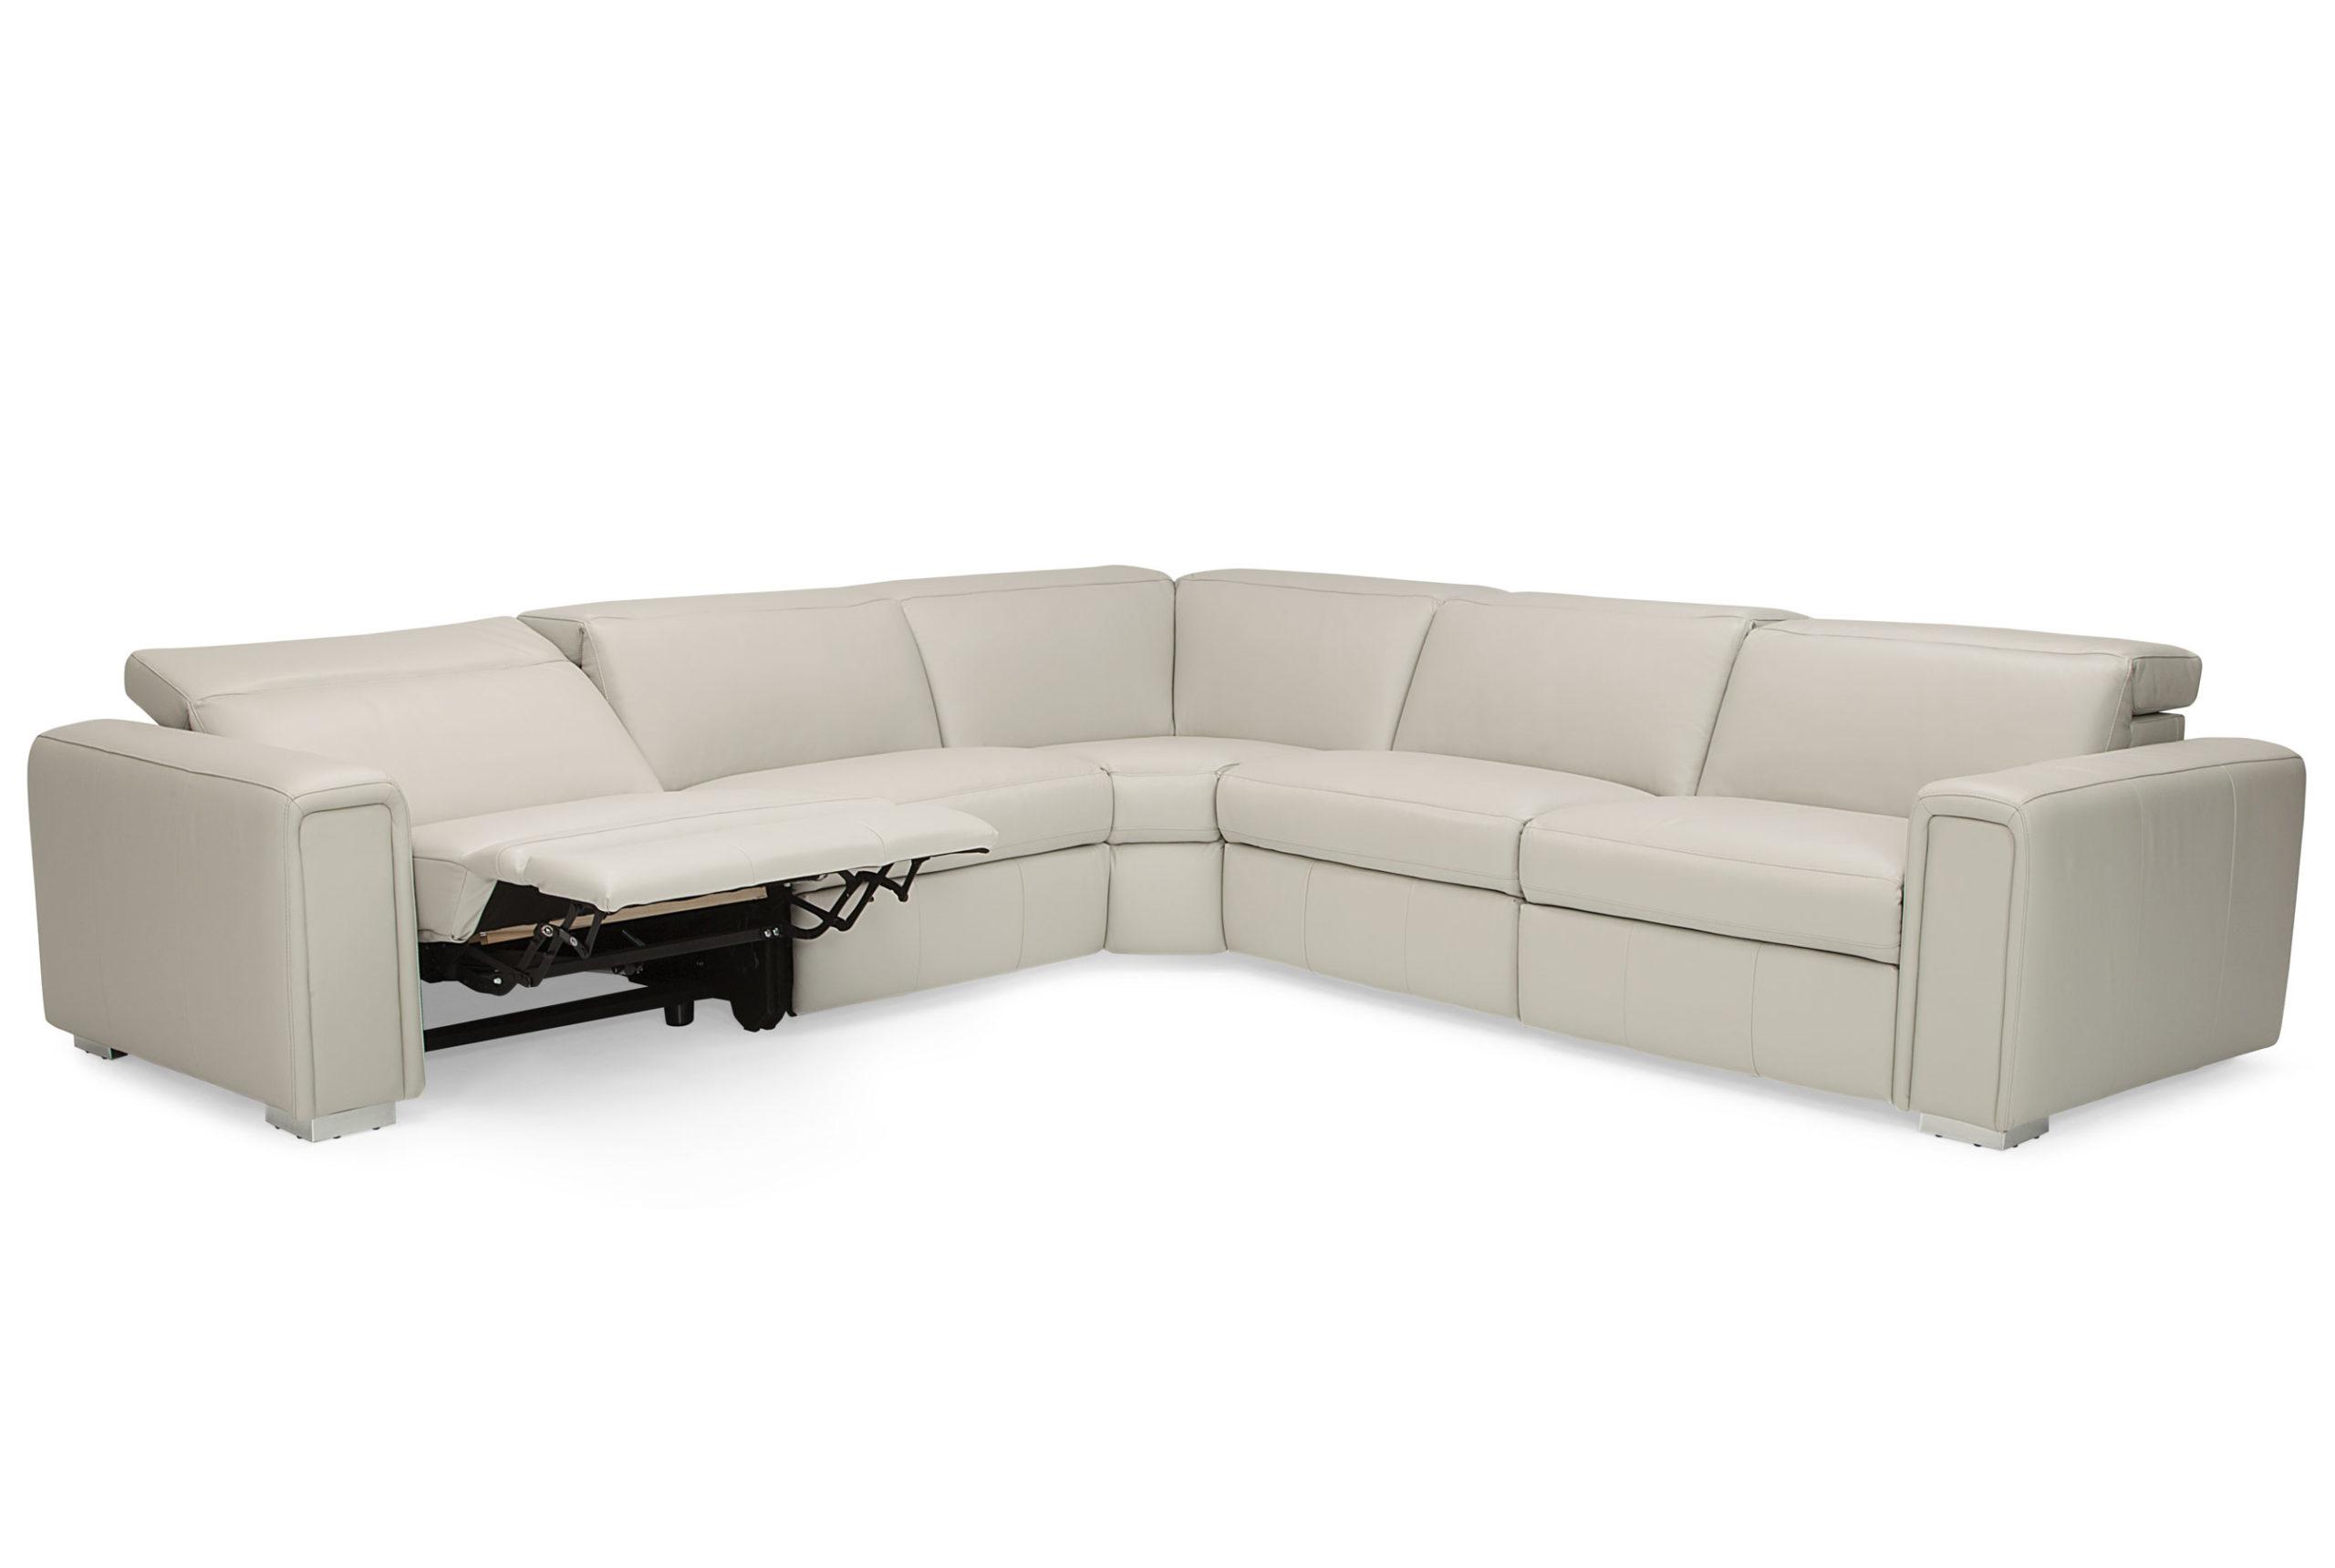 Palliser Titan 44004 Reclining Sectional With Power Within Titan Leather Power Reclining Sofas (View 3 of 15)